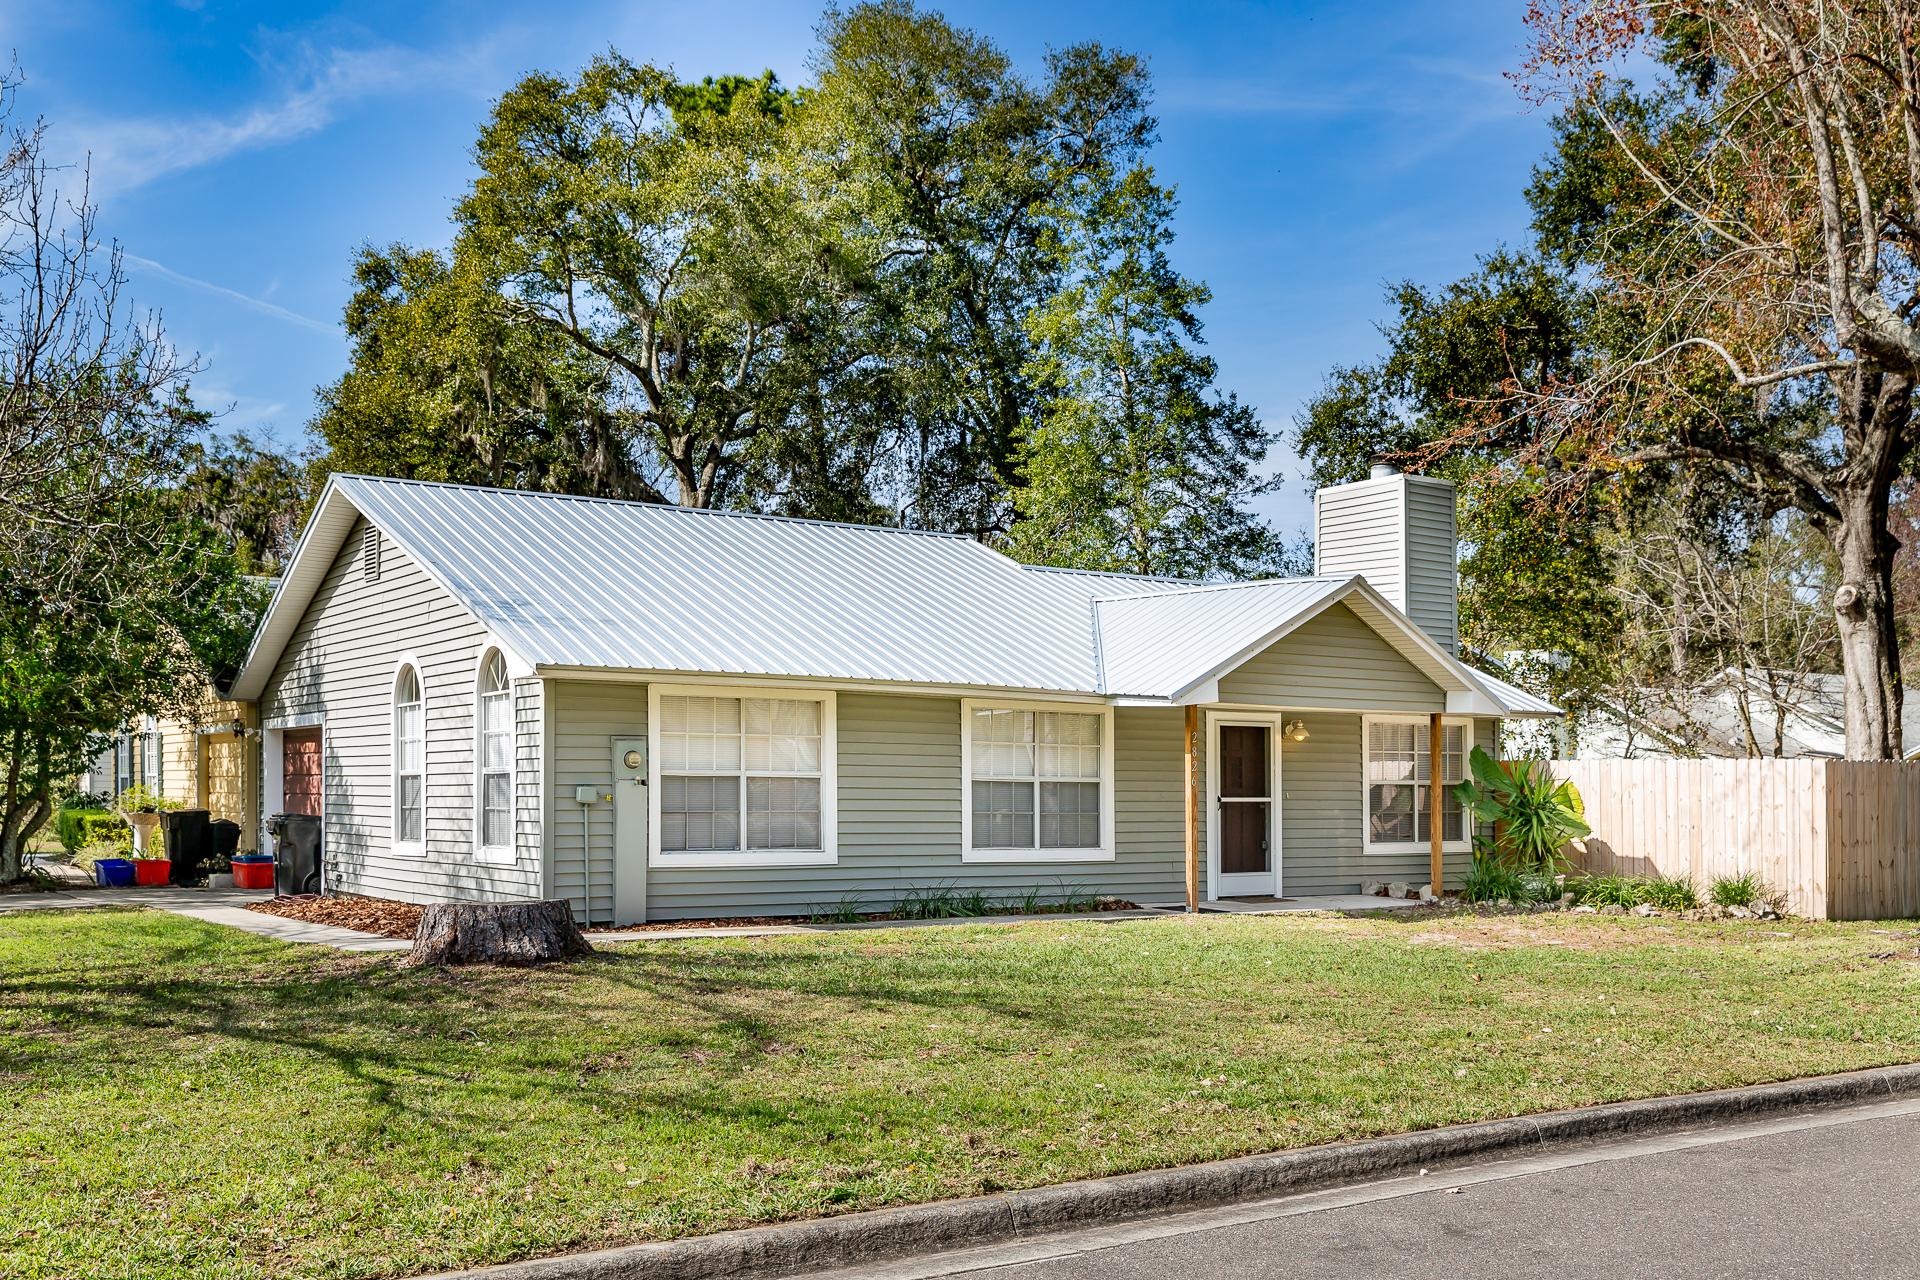 2826 SW 39th Avenue, Gainesville Florida 32608 - Rental home in Gainesville